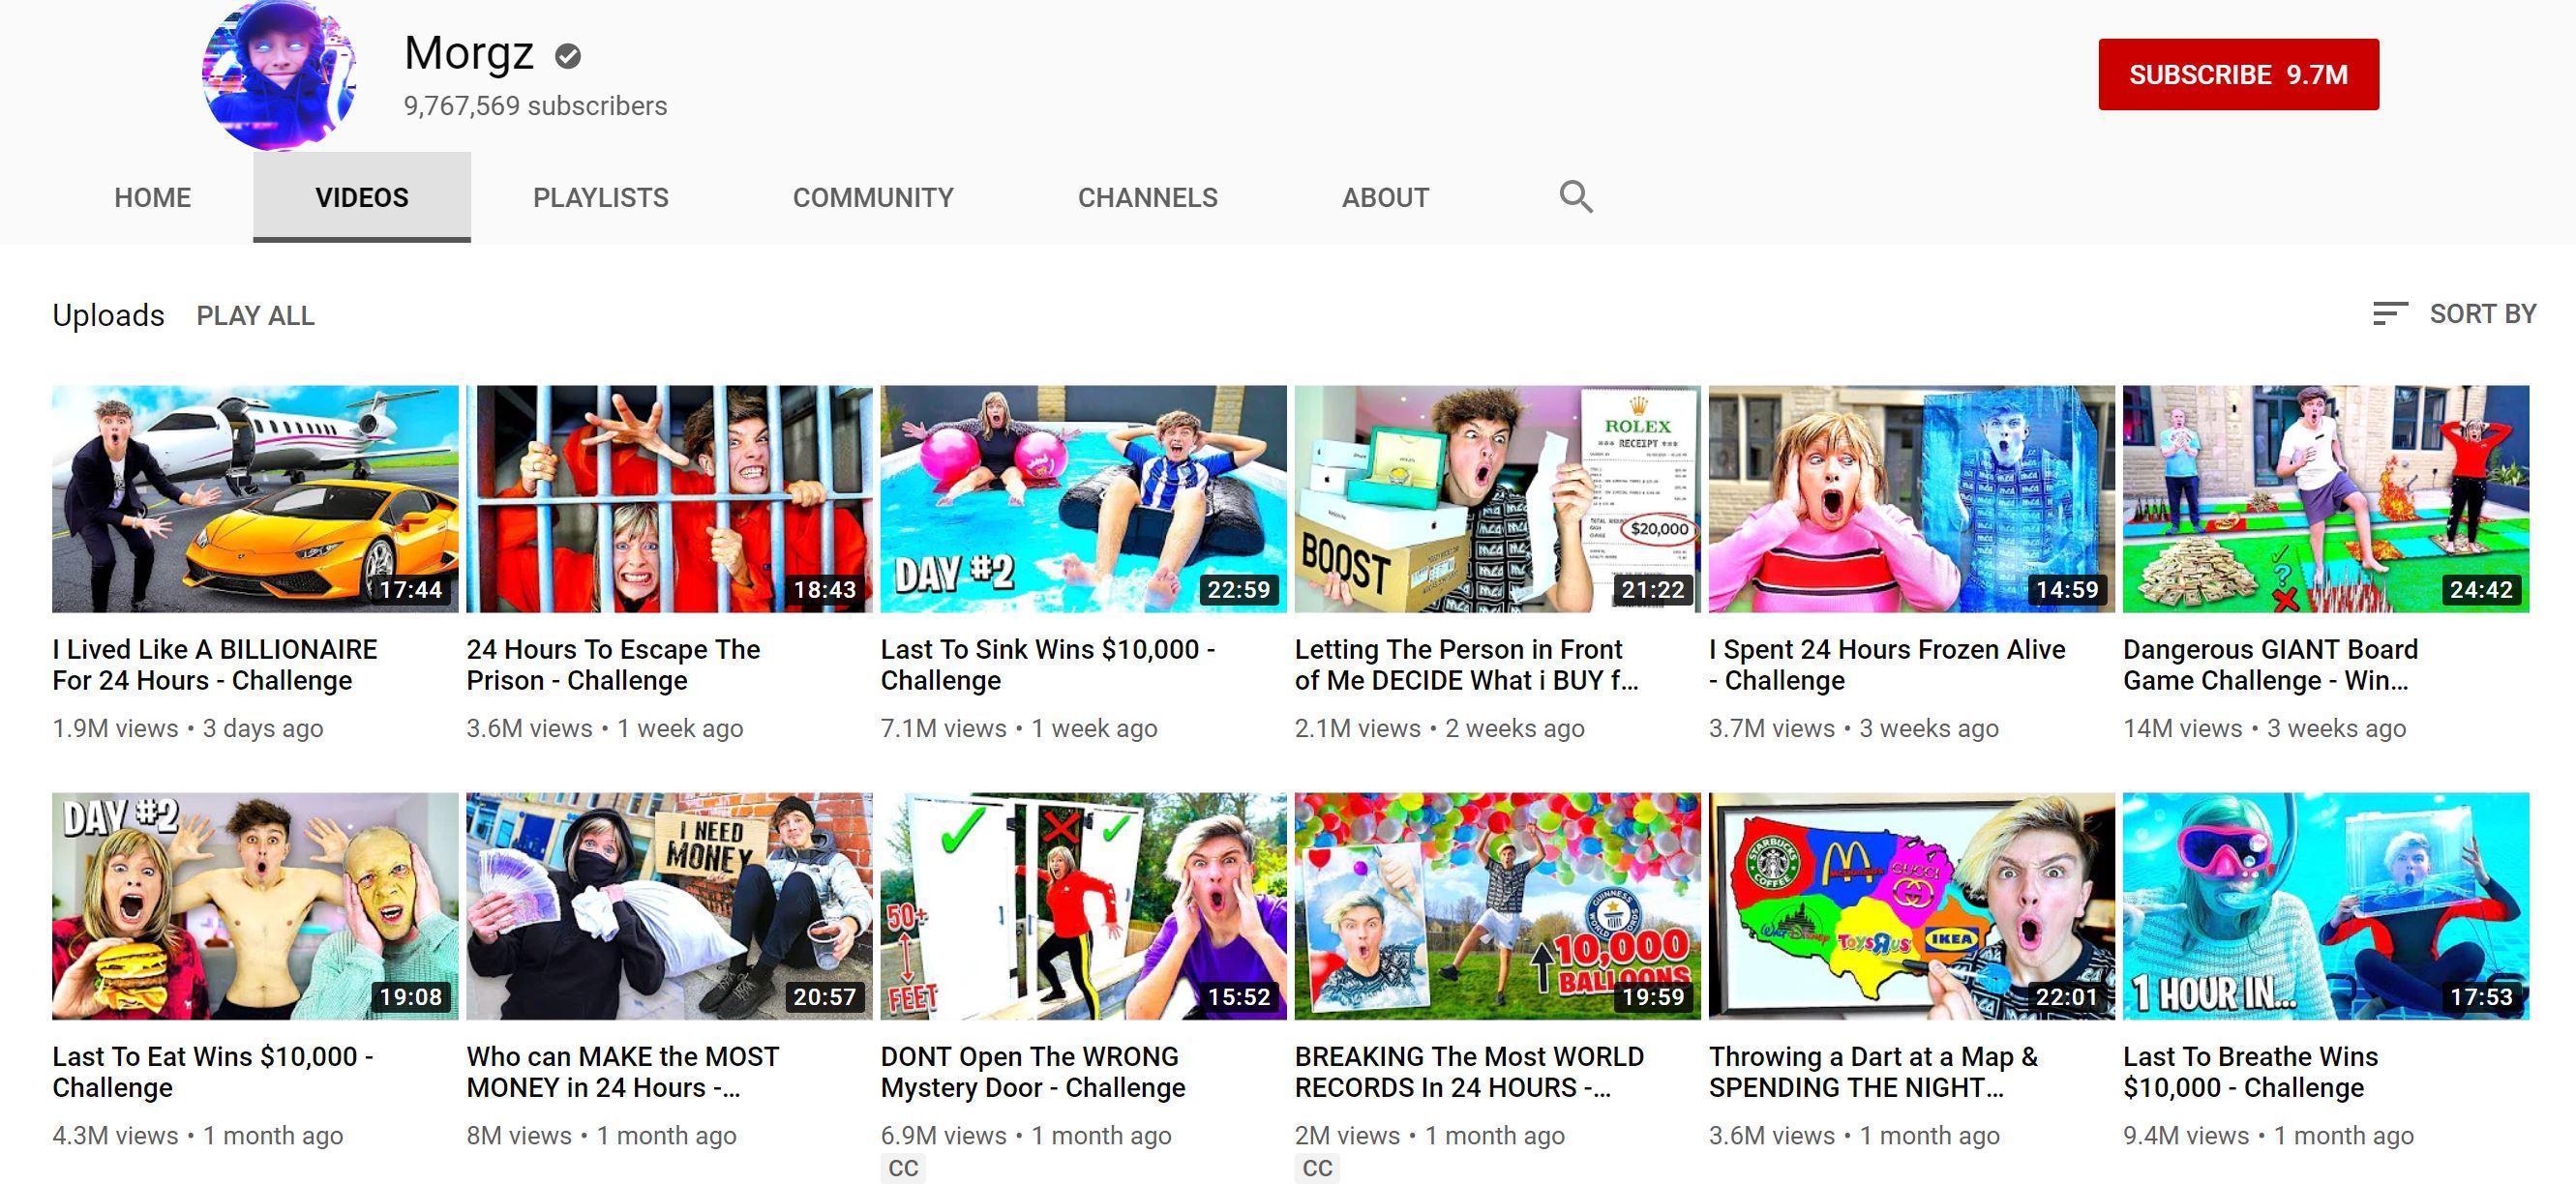 Morgz, YouTube